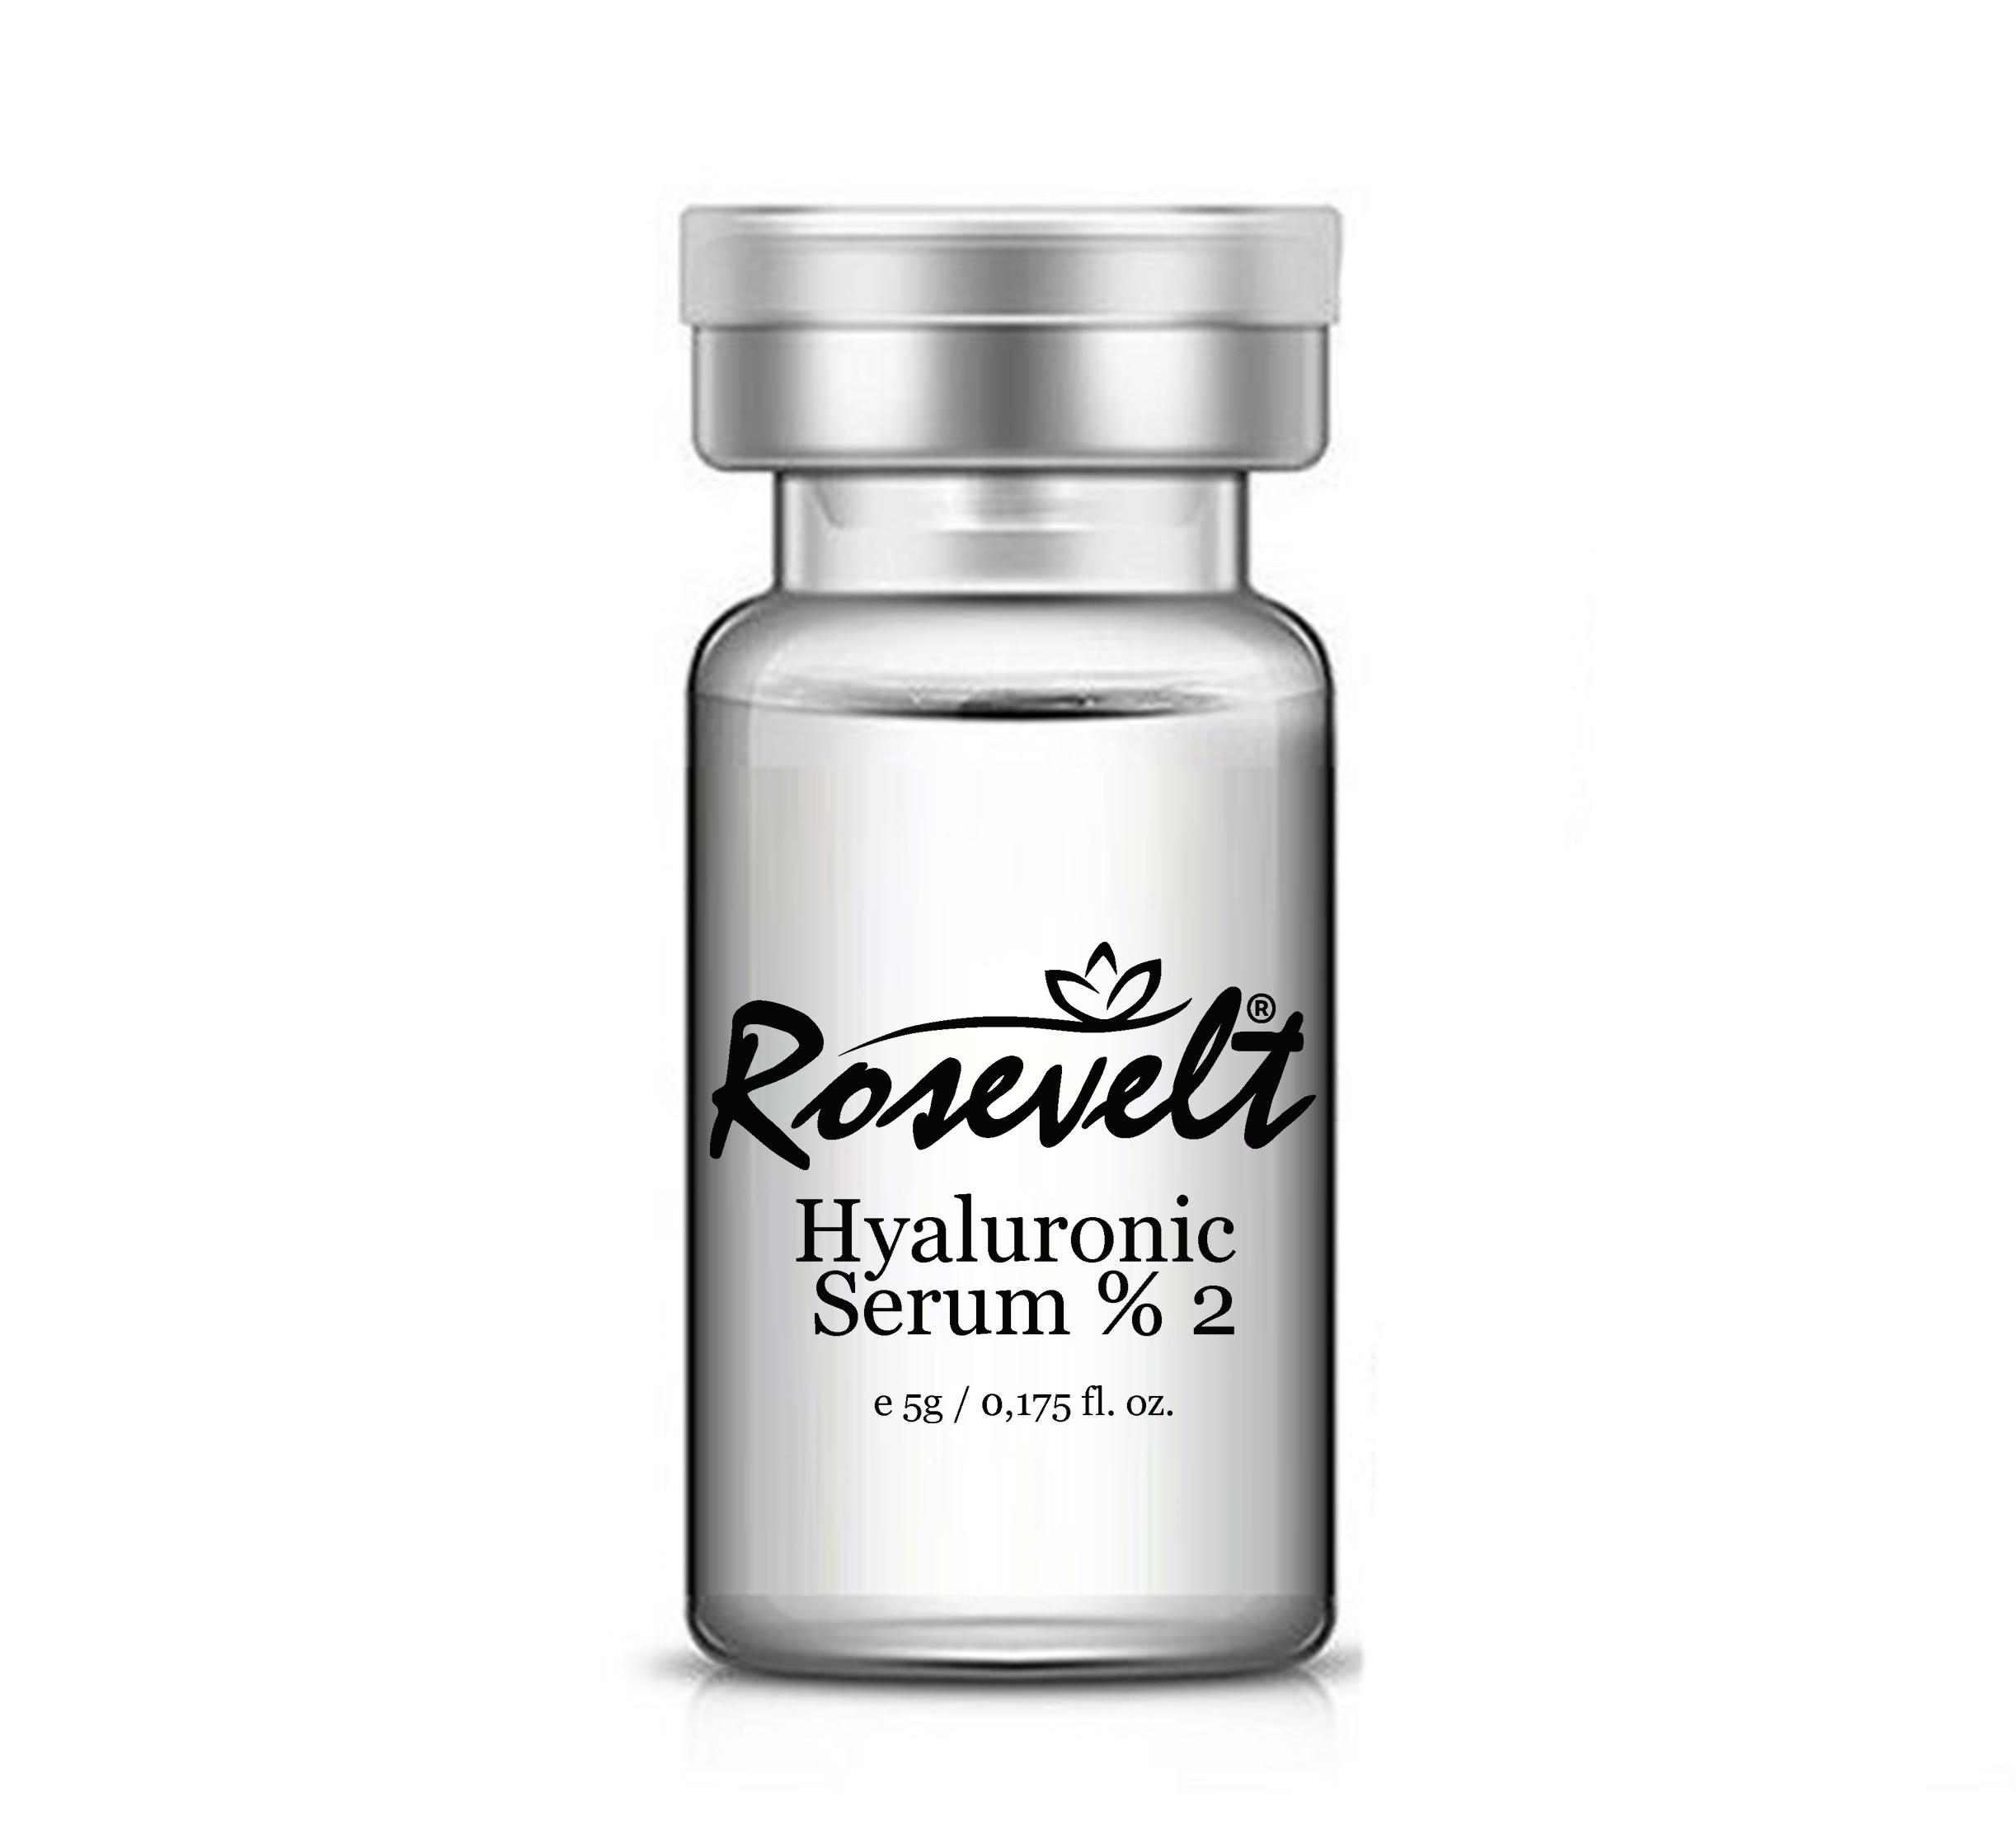 hyaluronicasit2 - ROSEVELT HYALURONİK ASİT % 2